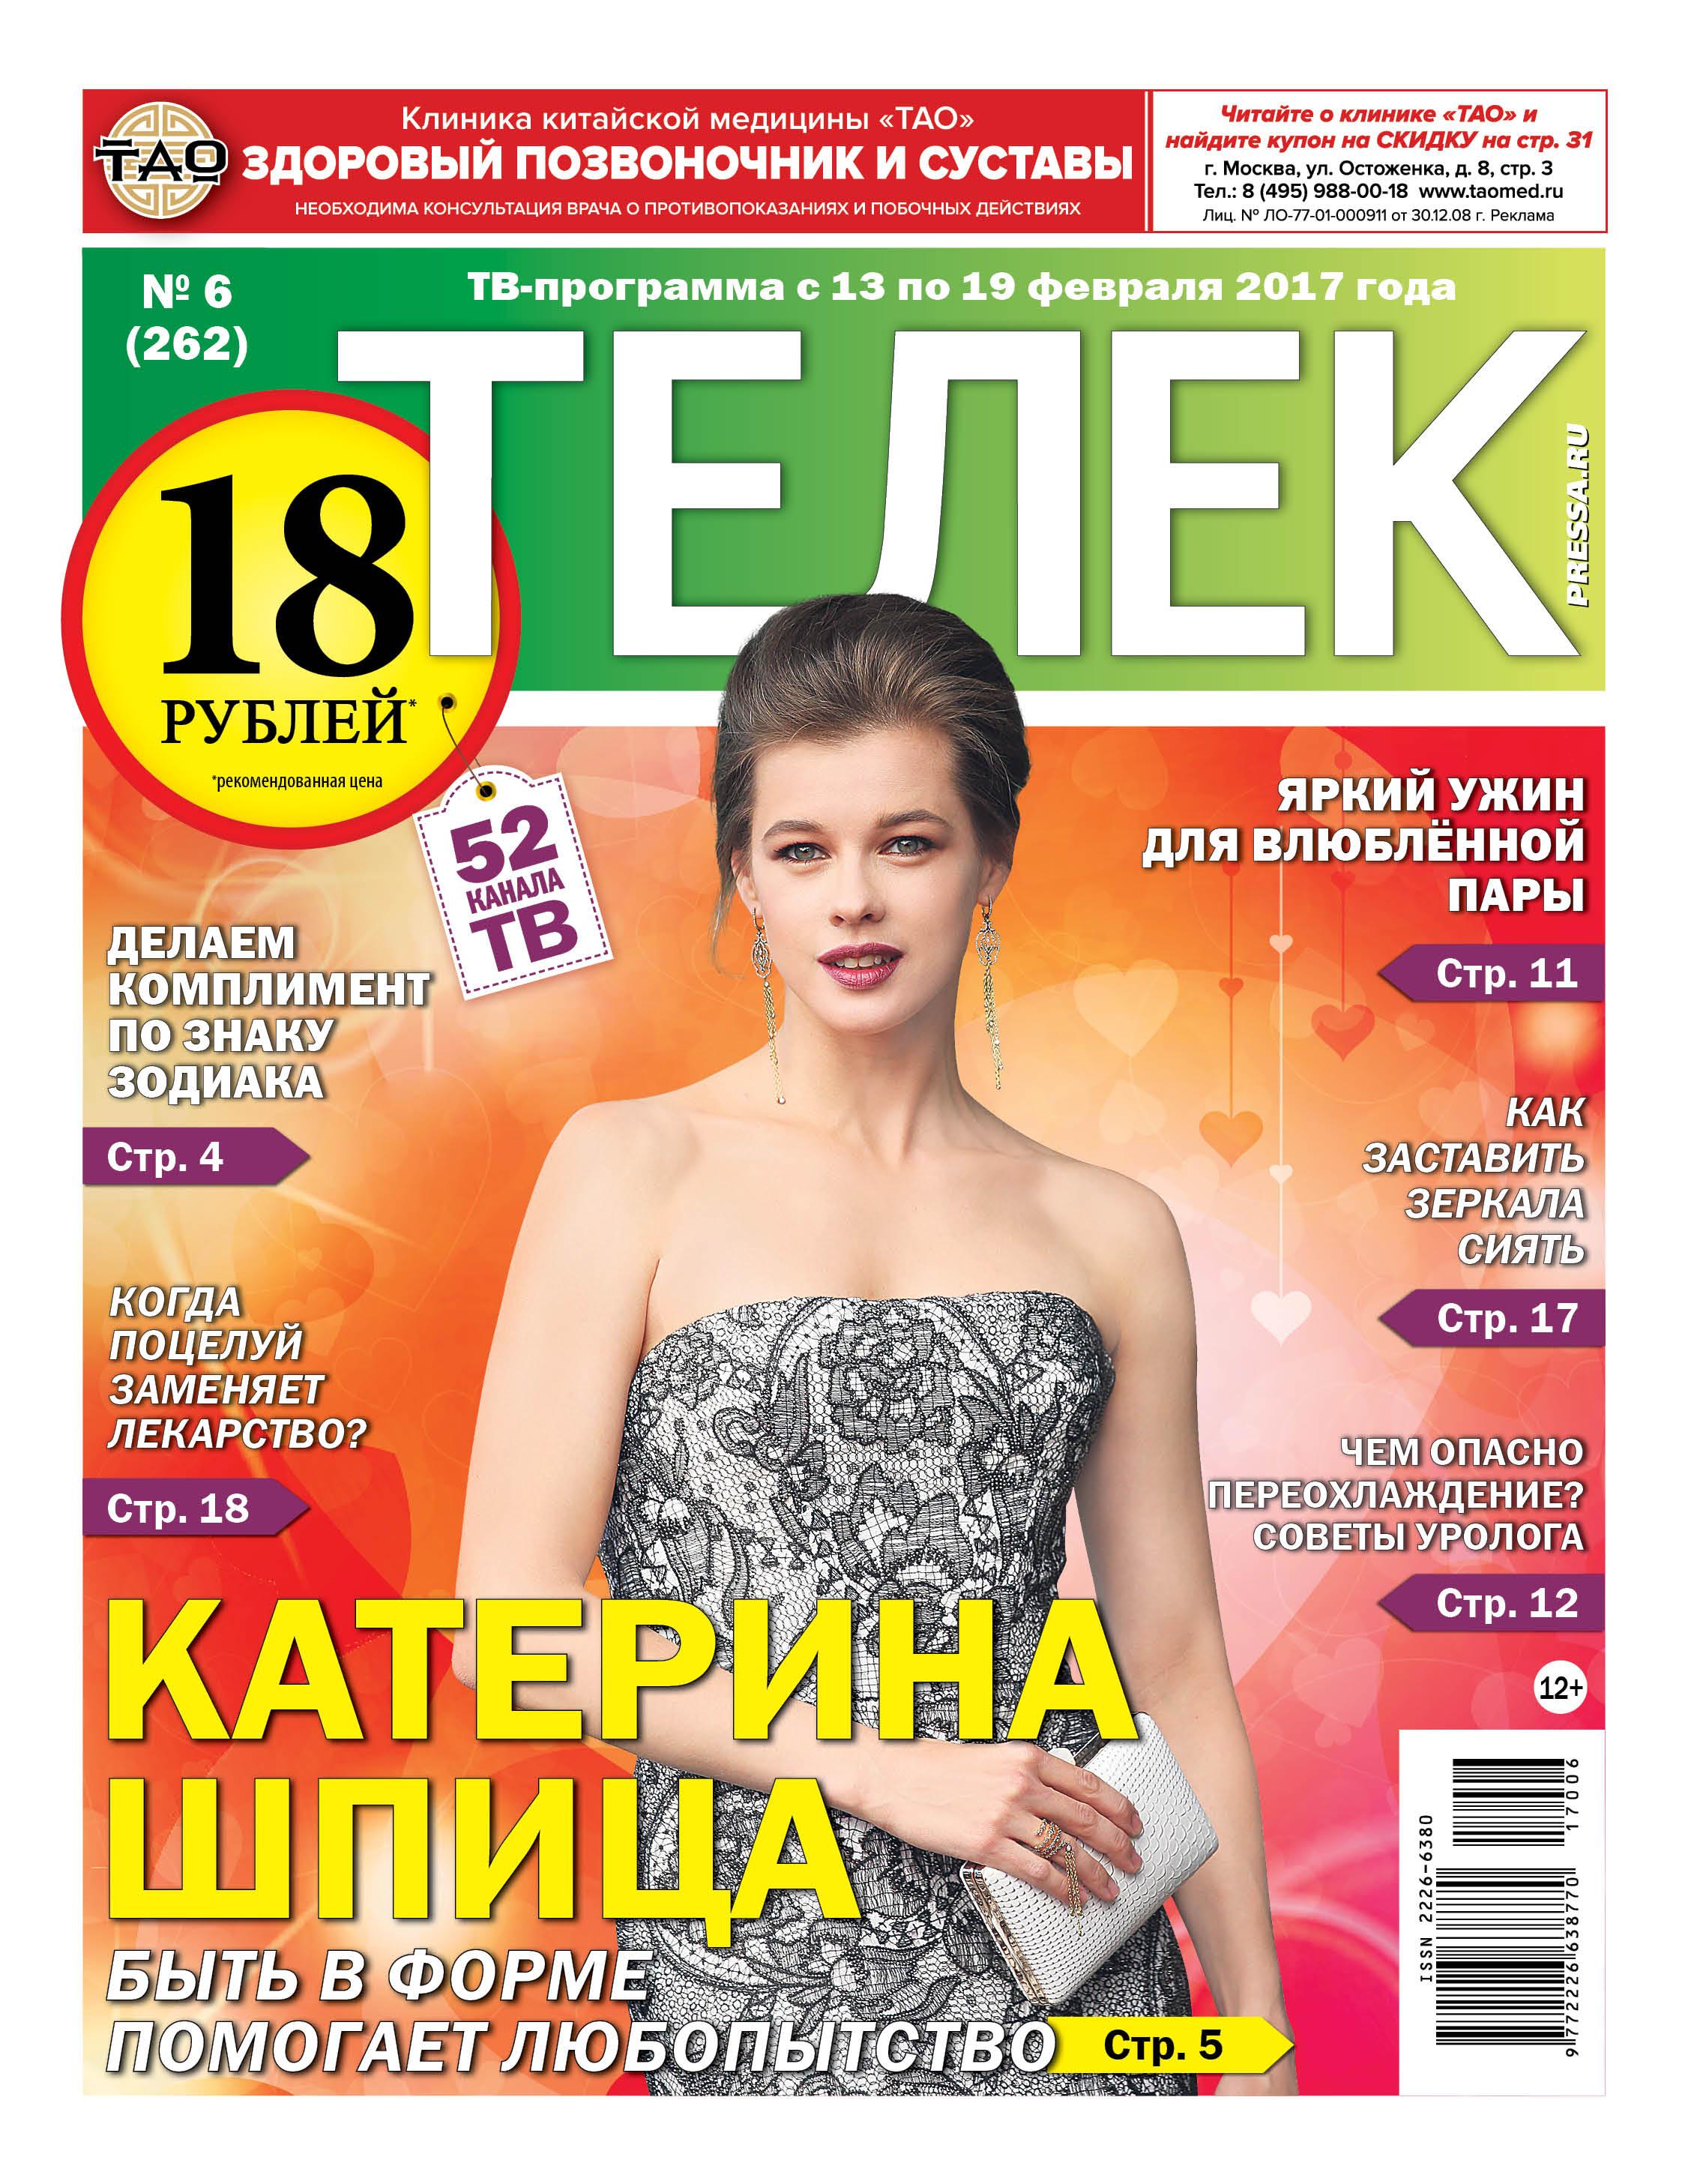 №6 (262) Катерина Шпица